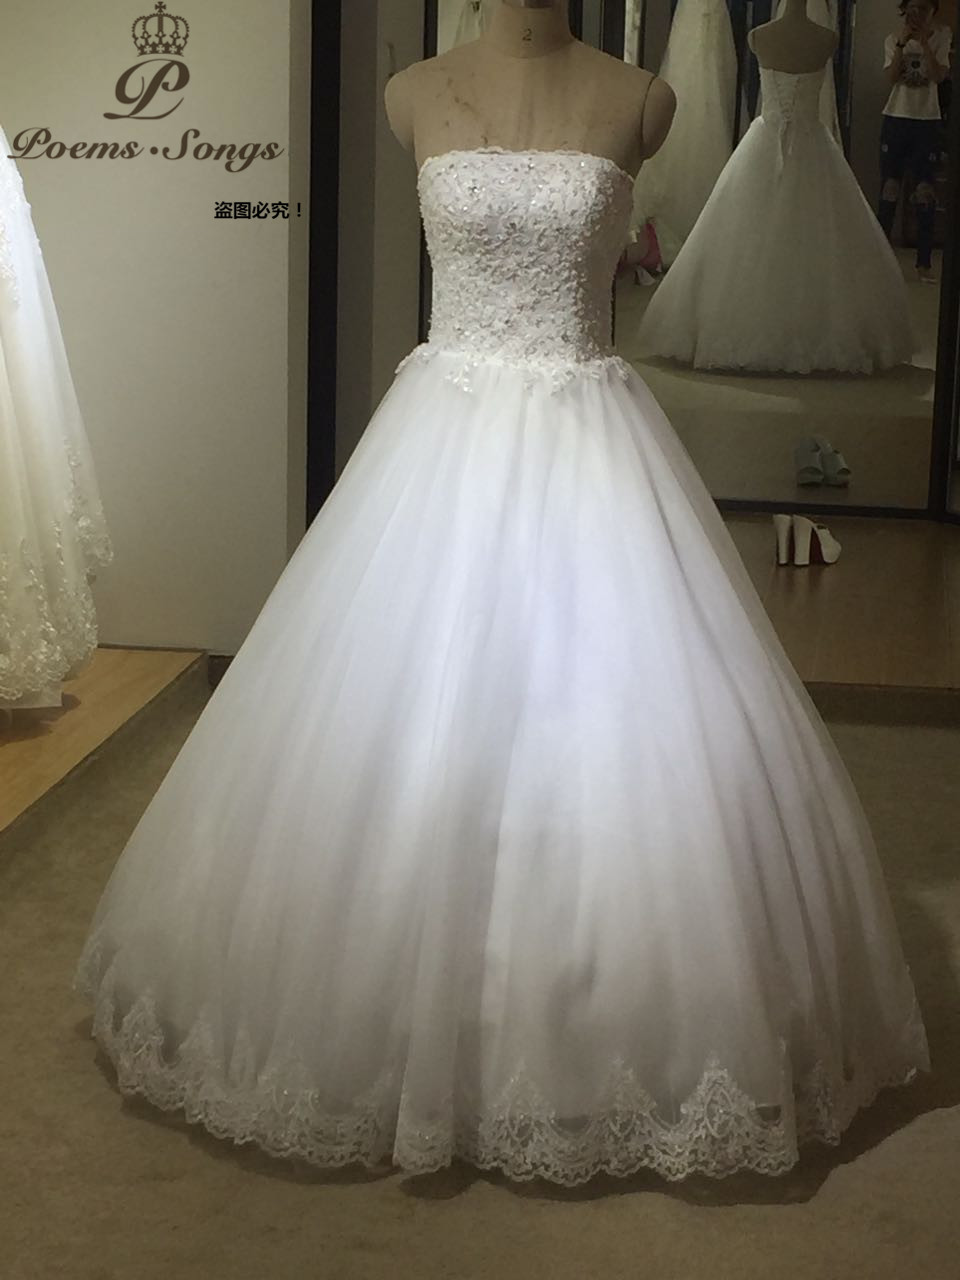 PoemsSongs High Quality Custom Made Lace Appliques Off The Shoulder Wedding Dresses Vestido De Noiva Brides